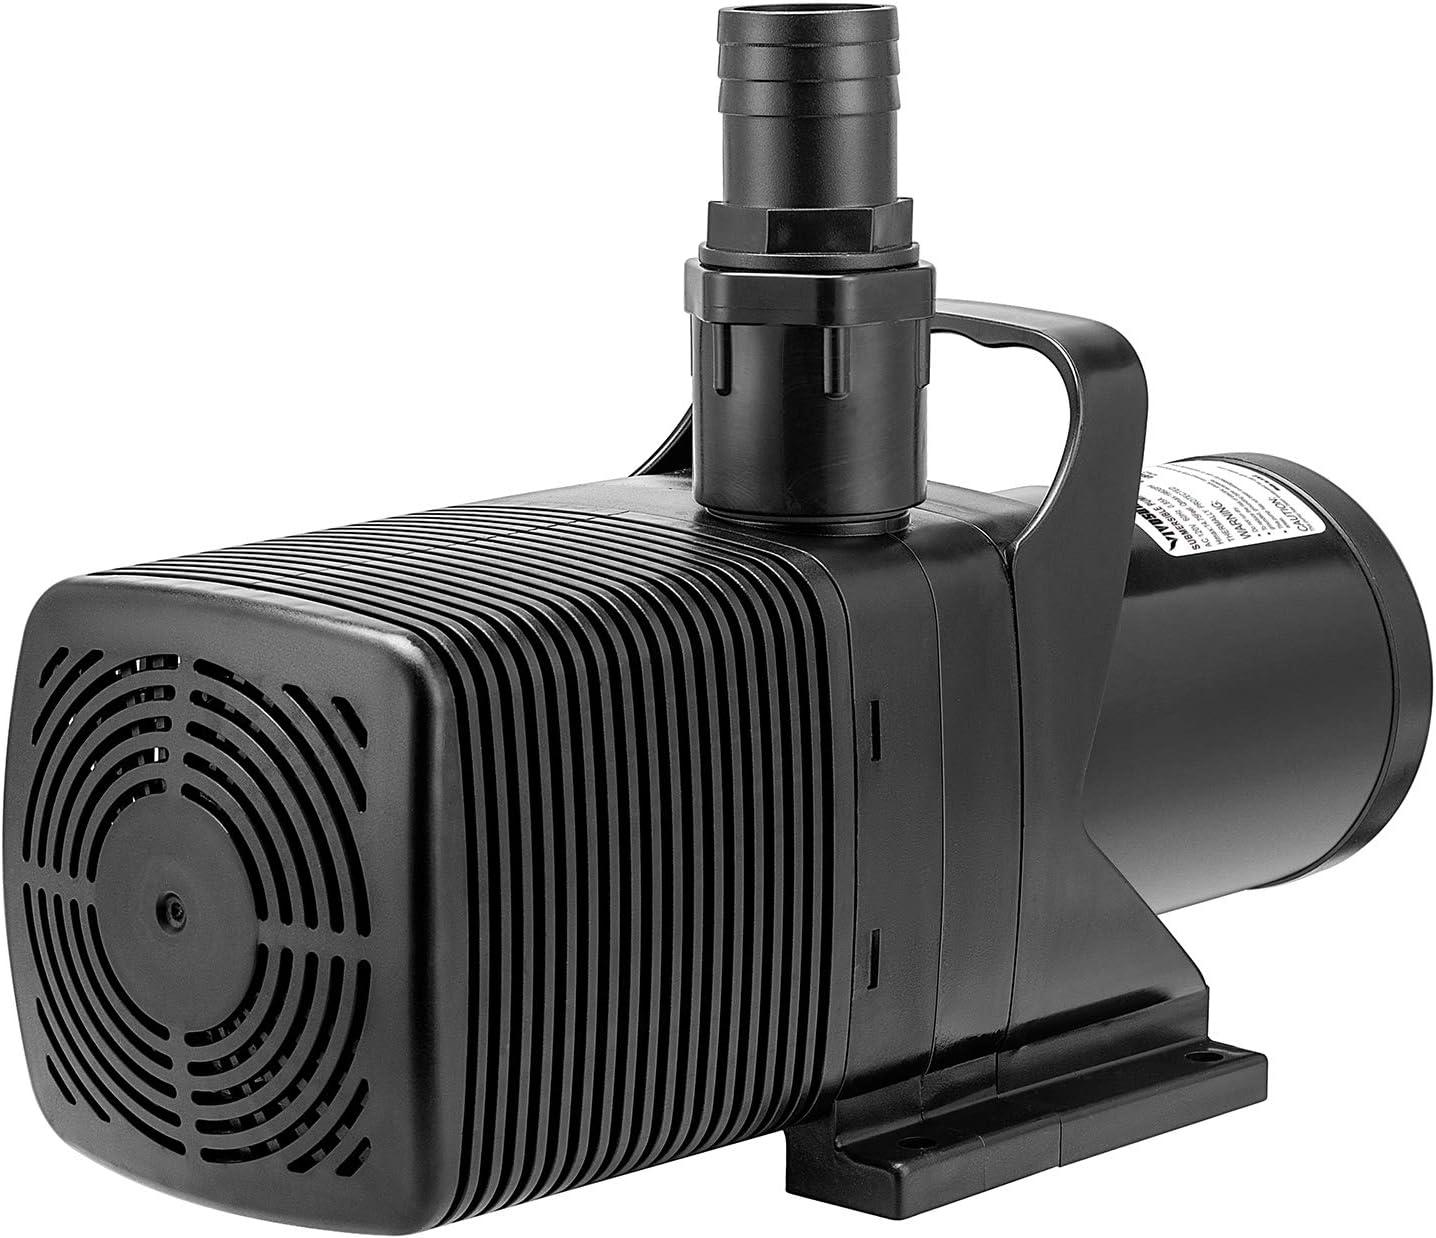 VIVOSUN 1982 Low Award-winning store price GPH Submersible Water Pump110W Ultra Quiet wit Pump